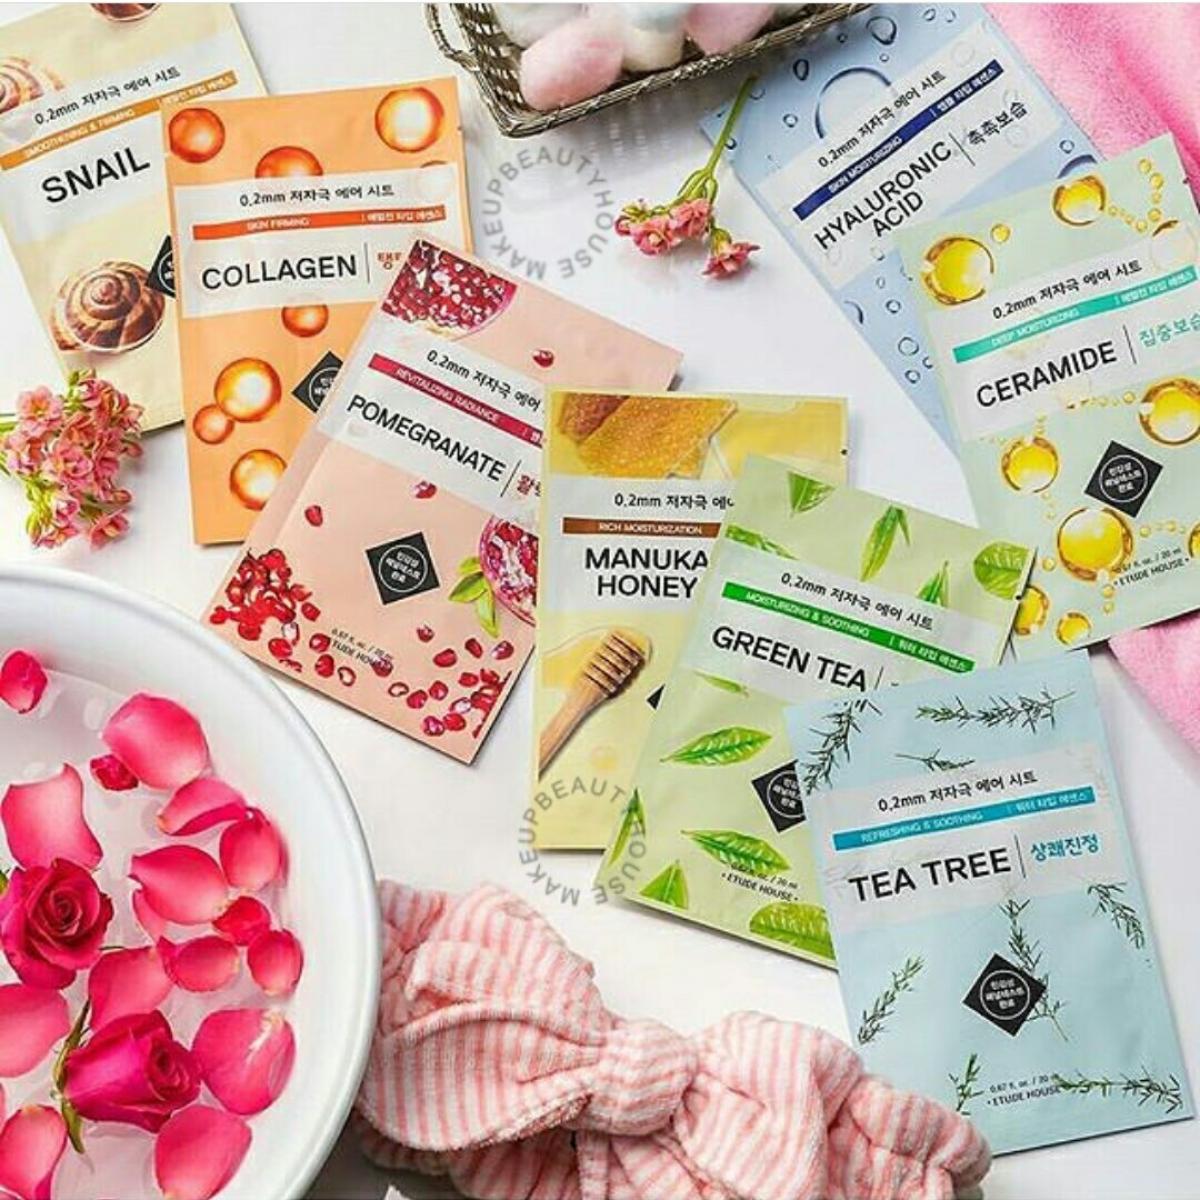 02 Mm Therapy Air Mask Sheet Makeup Beauty House Etude 3 Pcs Prev Next